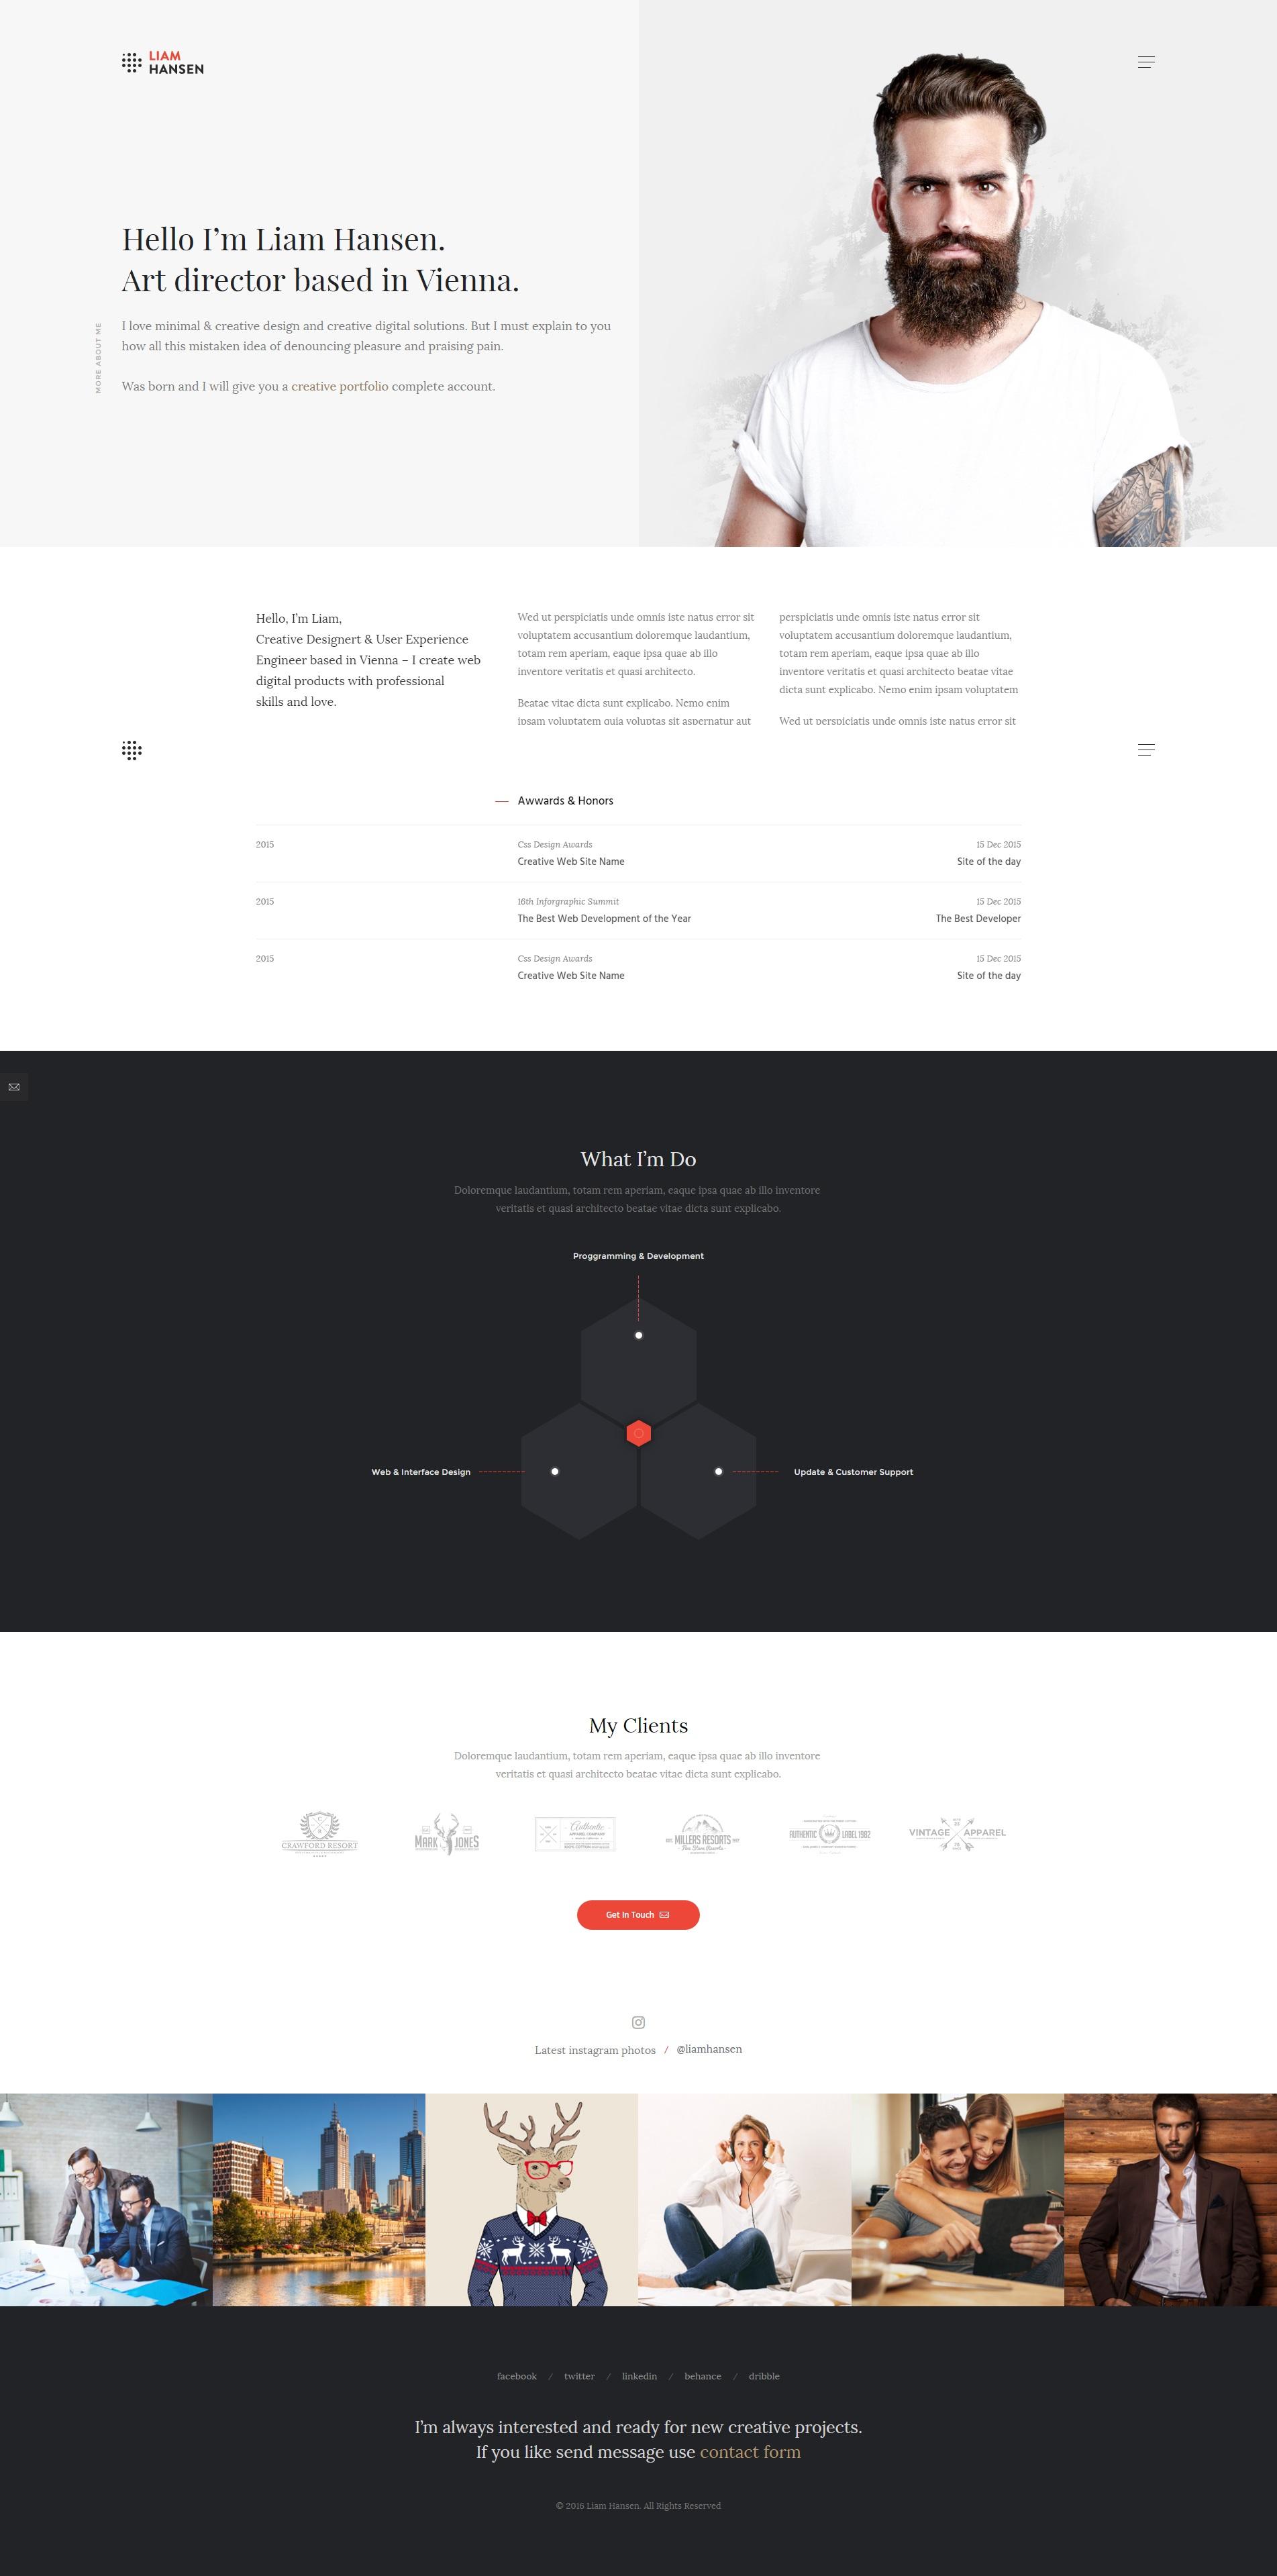 Liam - HTML Creative Freelancers & Agency Template by WebLionMedia